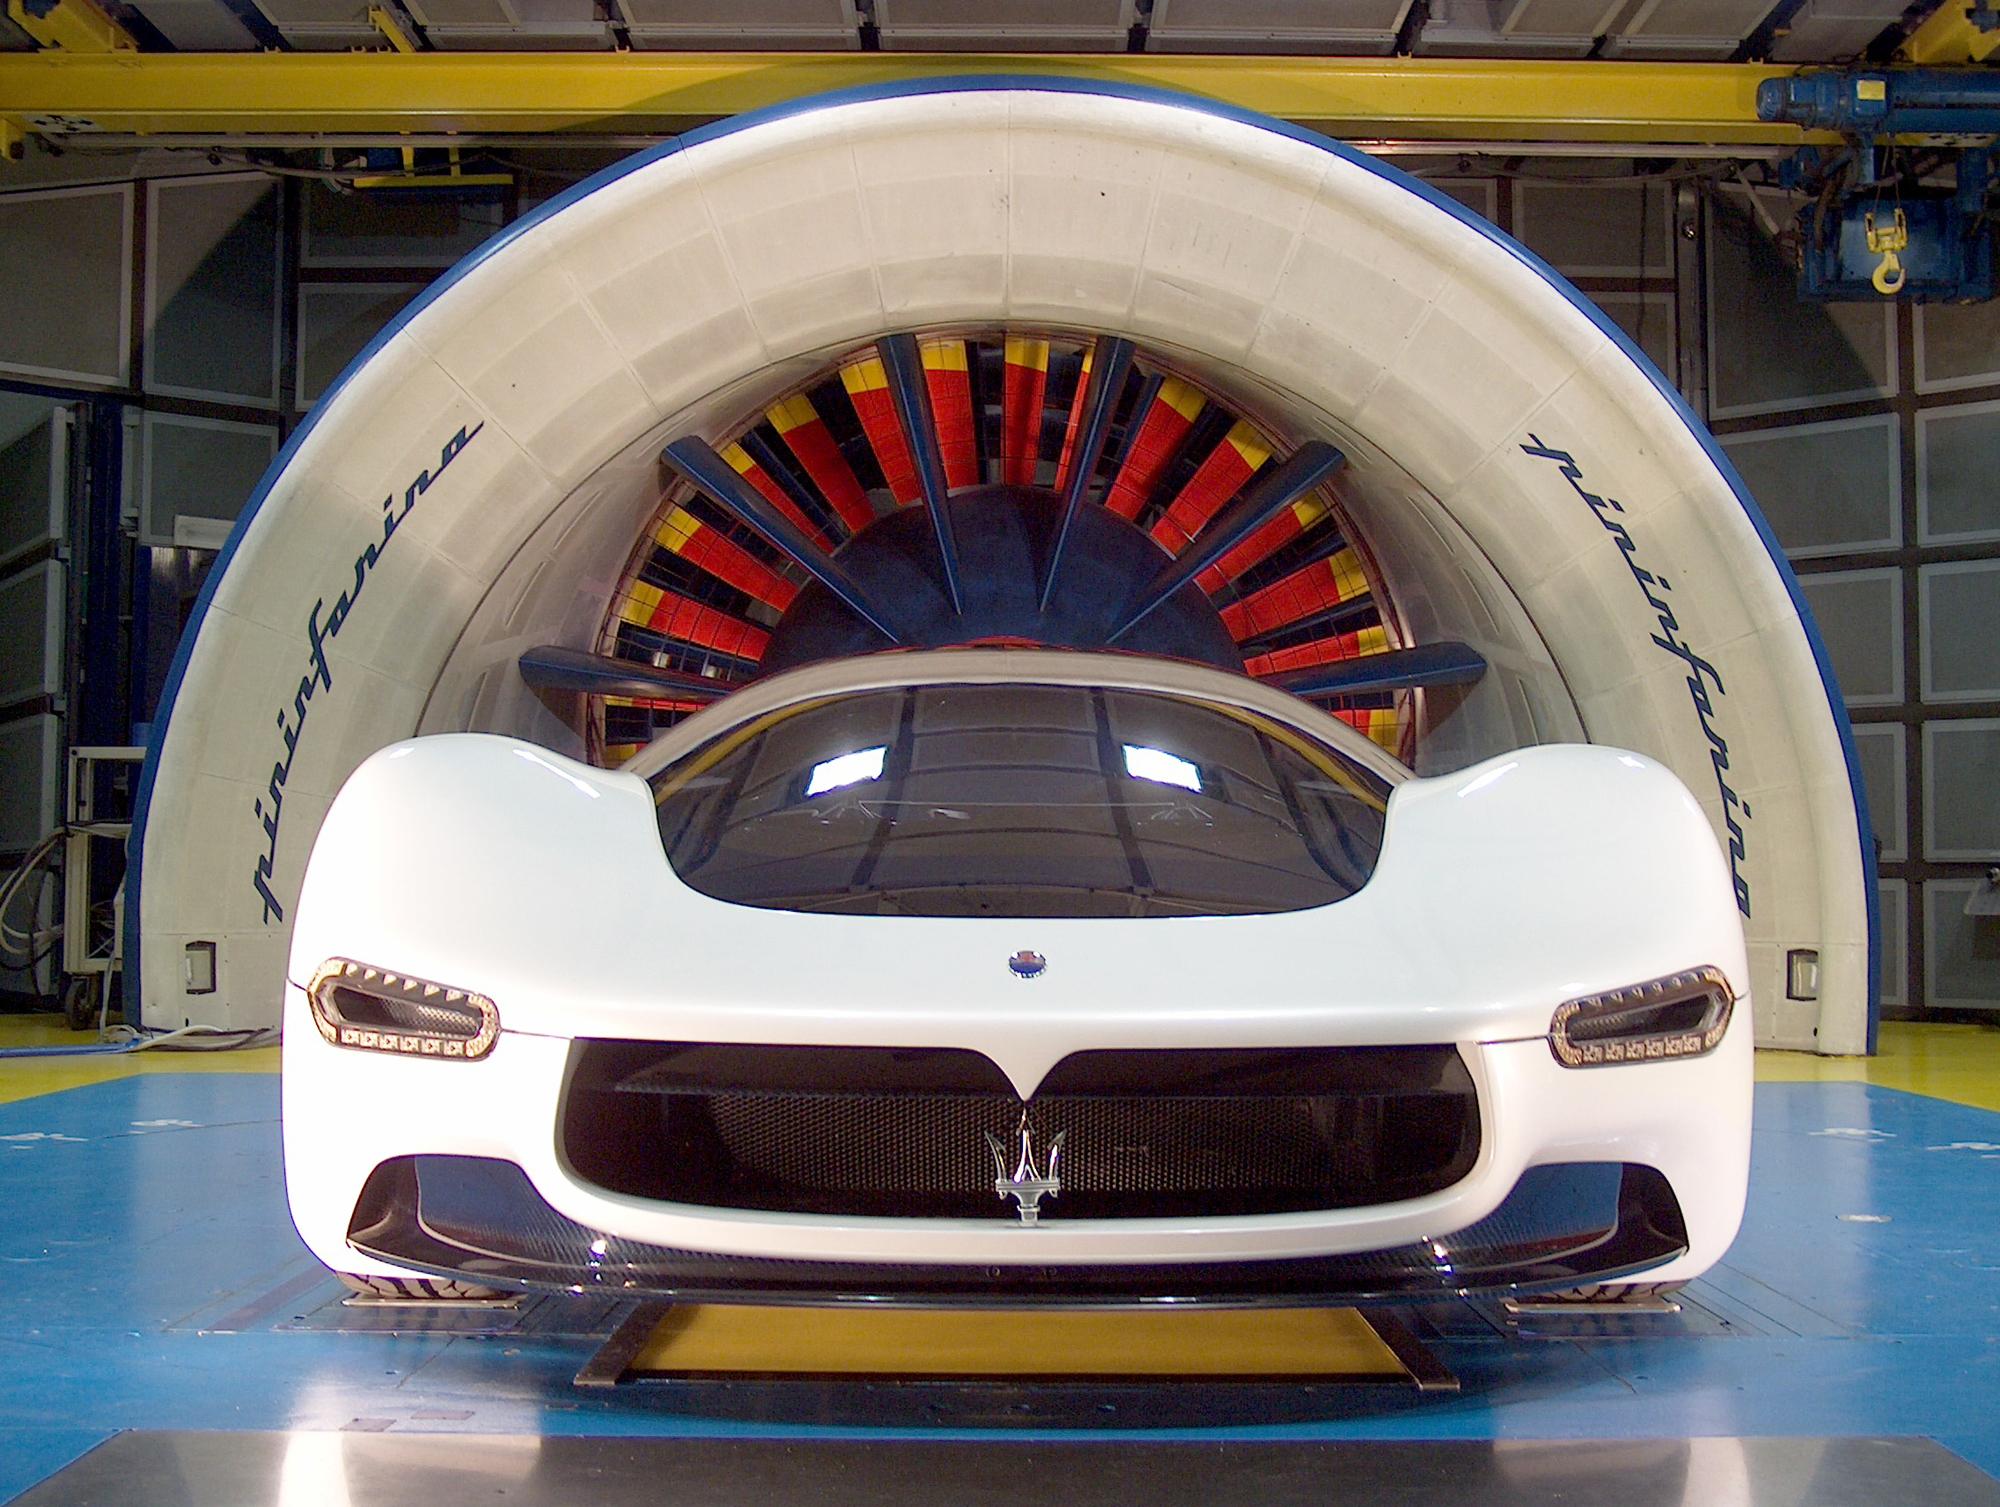 Windtunnelvon Pininfarina mit einem Maserati Birdcage, 2005.Foto: Pininfarina